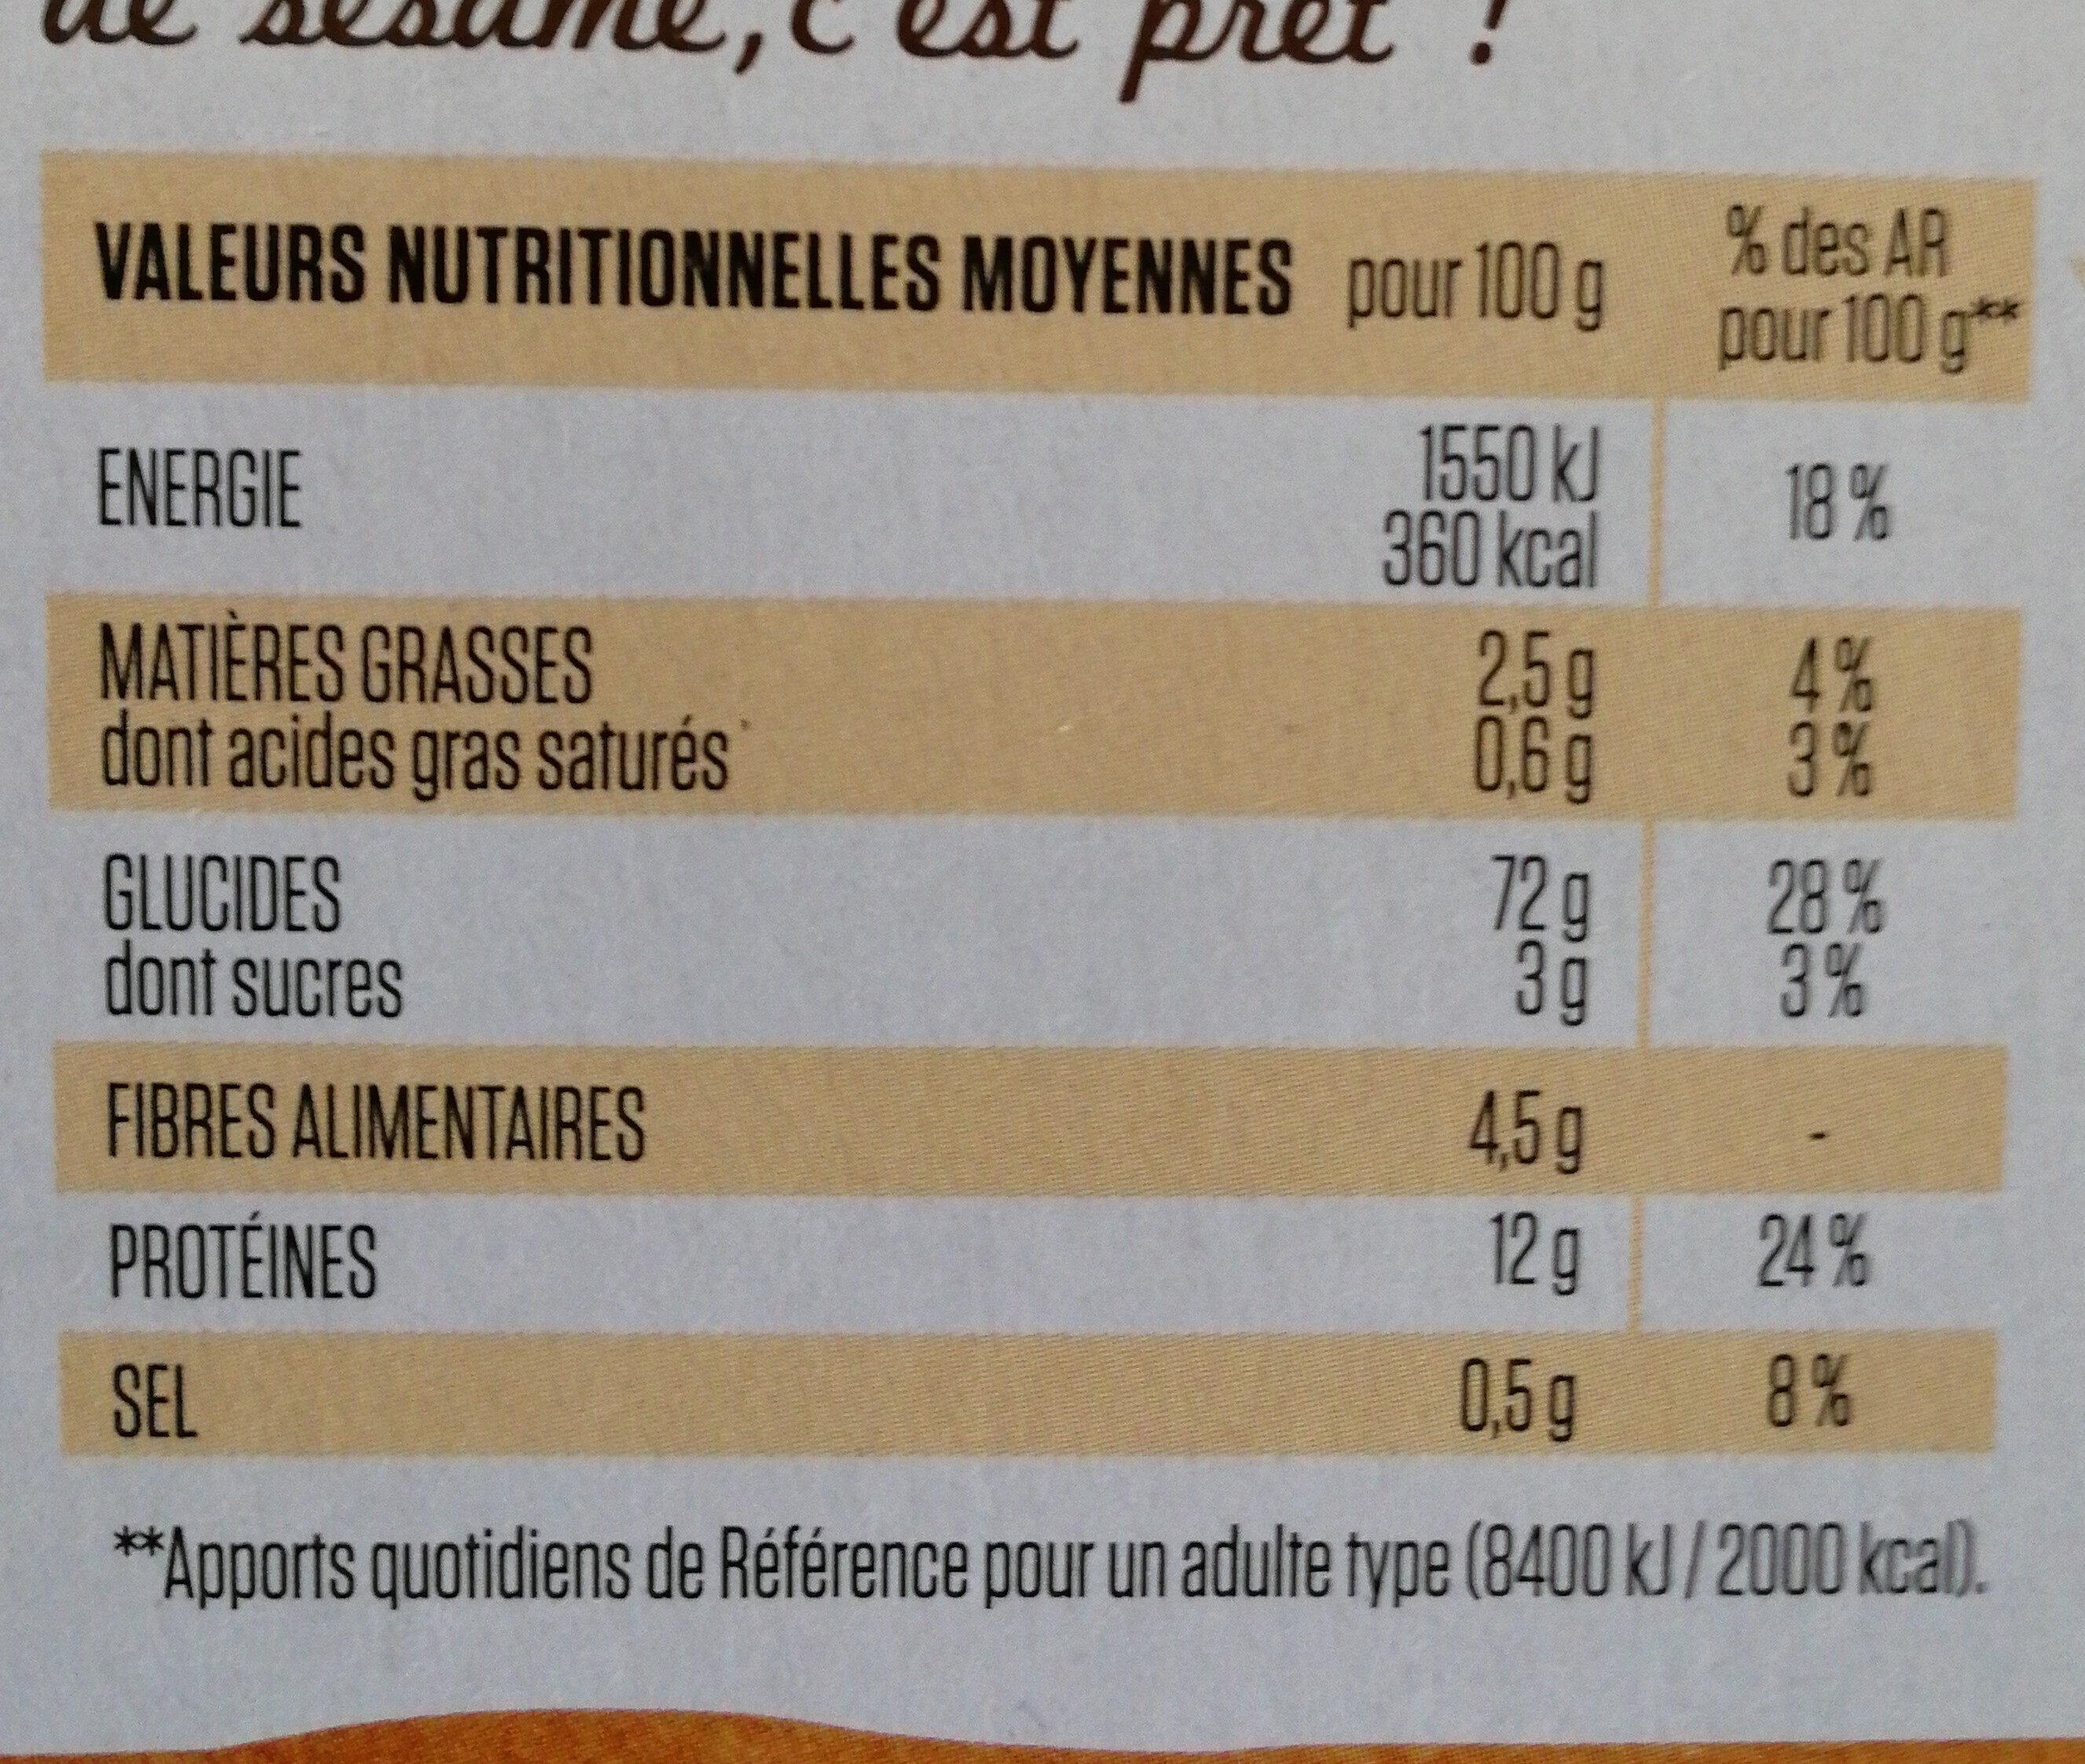 tartines craquantes sarrasin - Informations nutritionnelles - fr